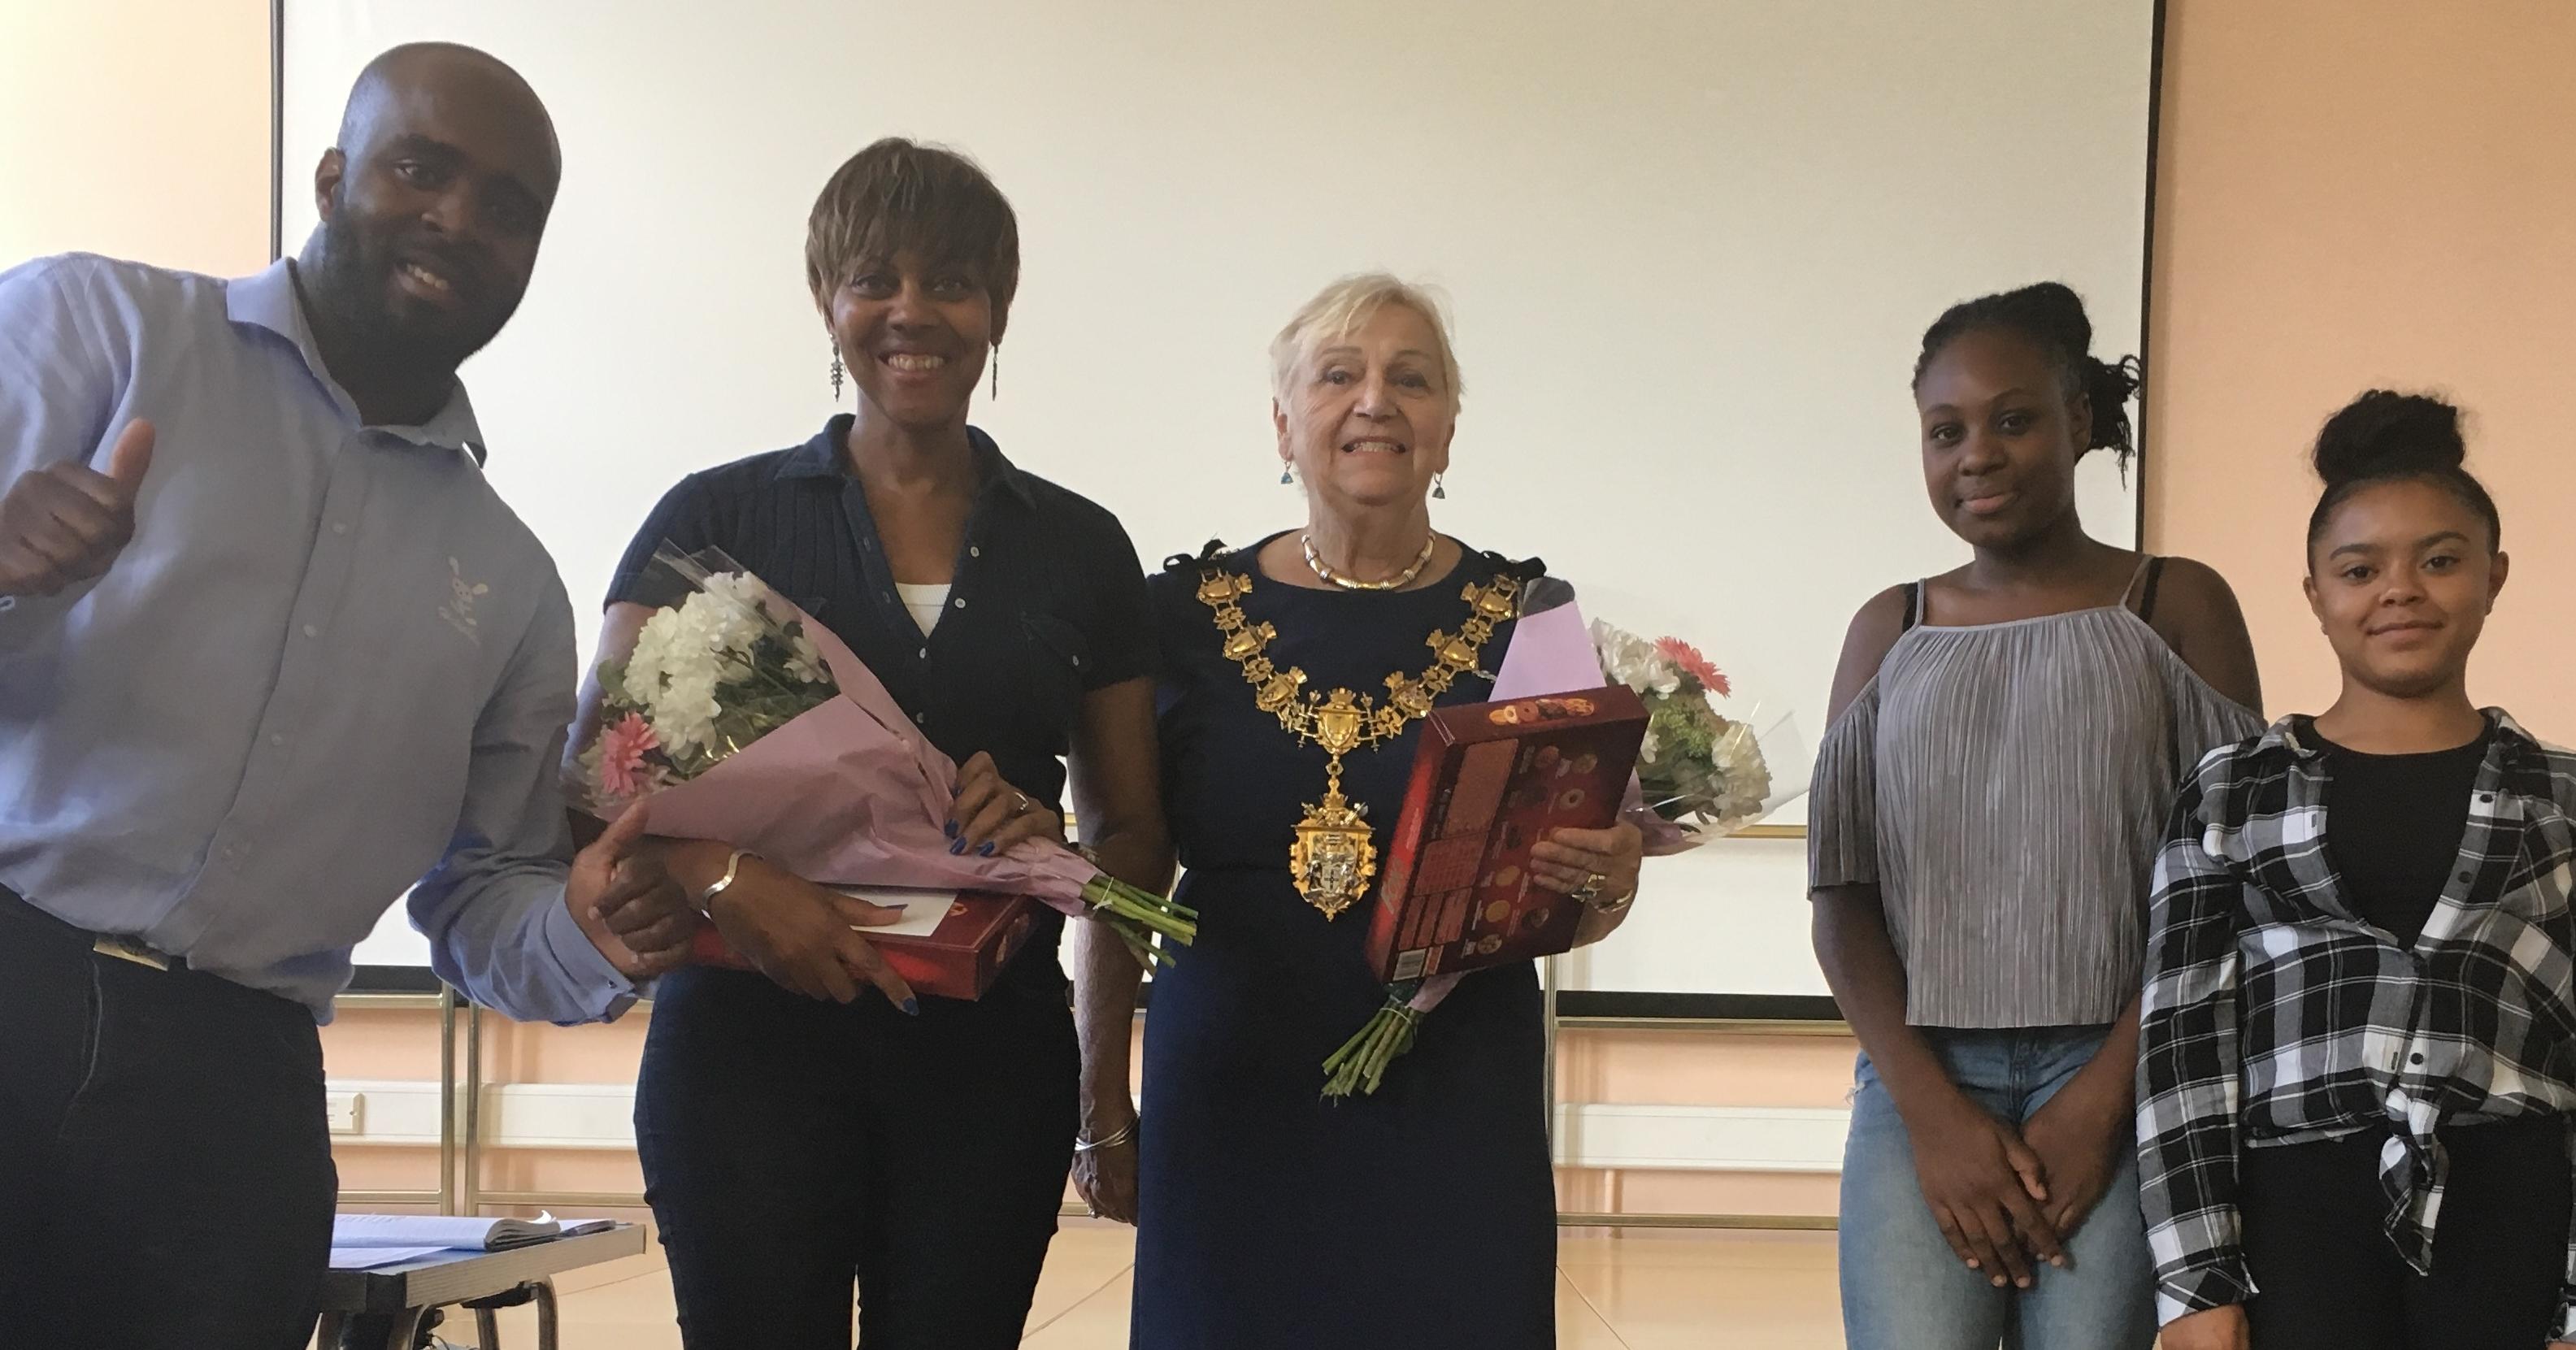 Appreciation awards from Daniel, Holiplay's Director to Evadne & The Mayor of Croydon.